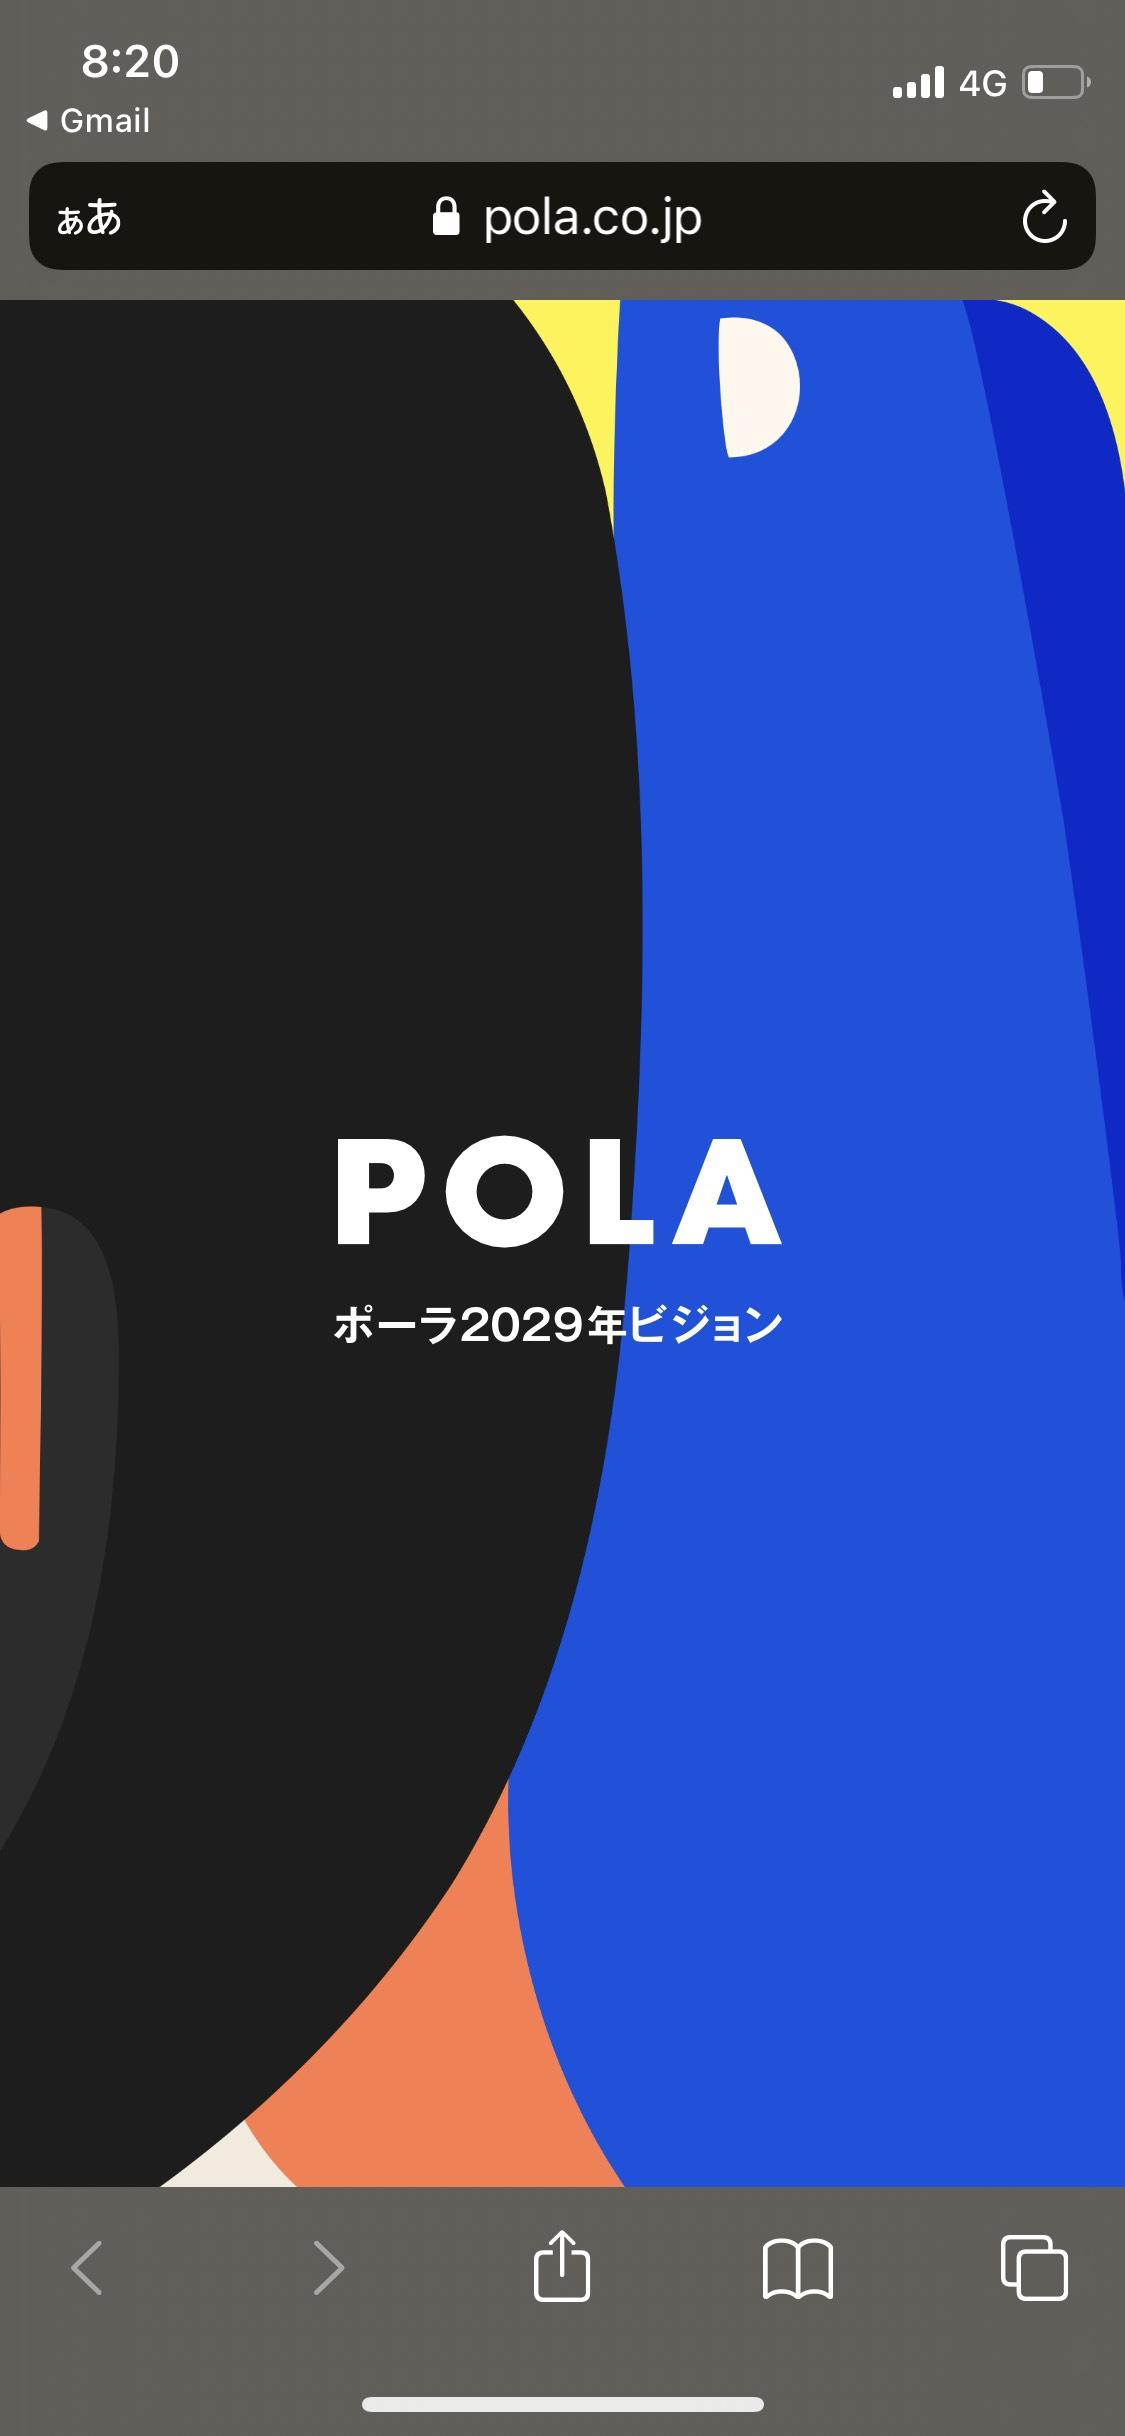 POLA 2029年ビジョン | ポーラ公式 エイジングケアと美白・化粧品のサイト